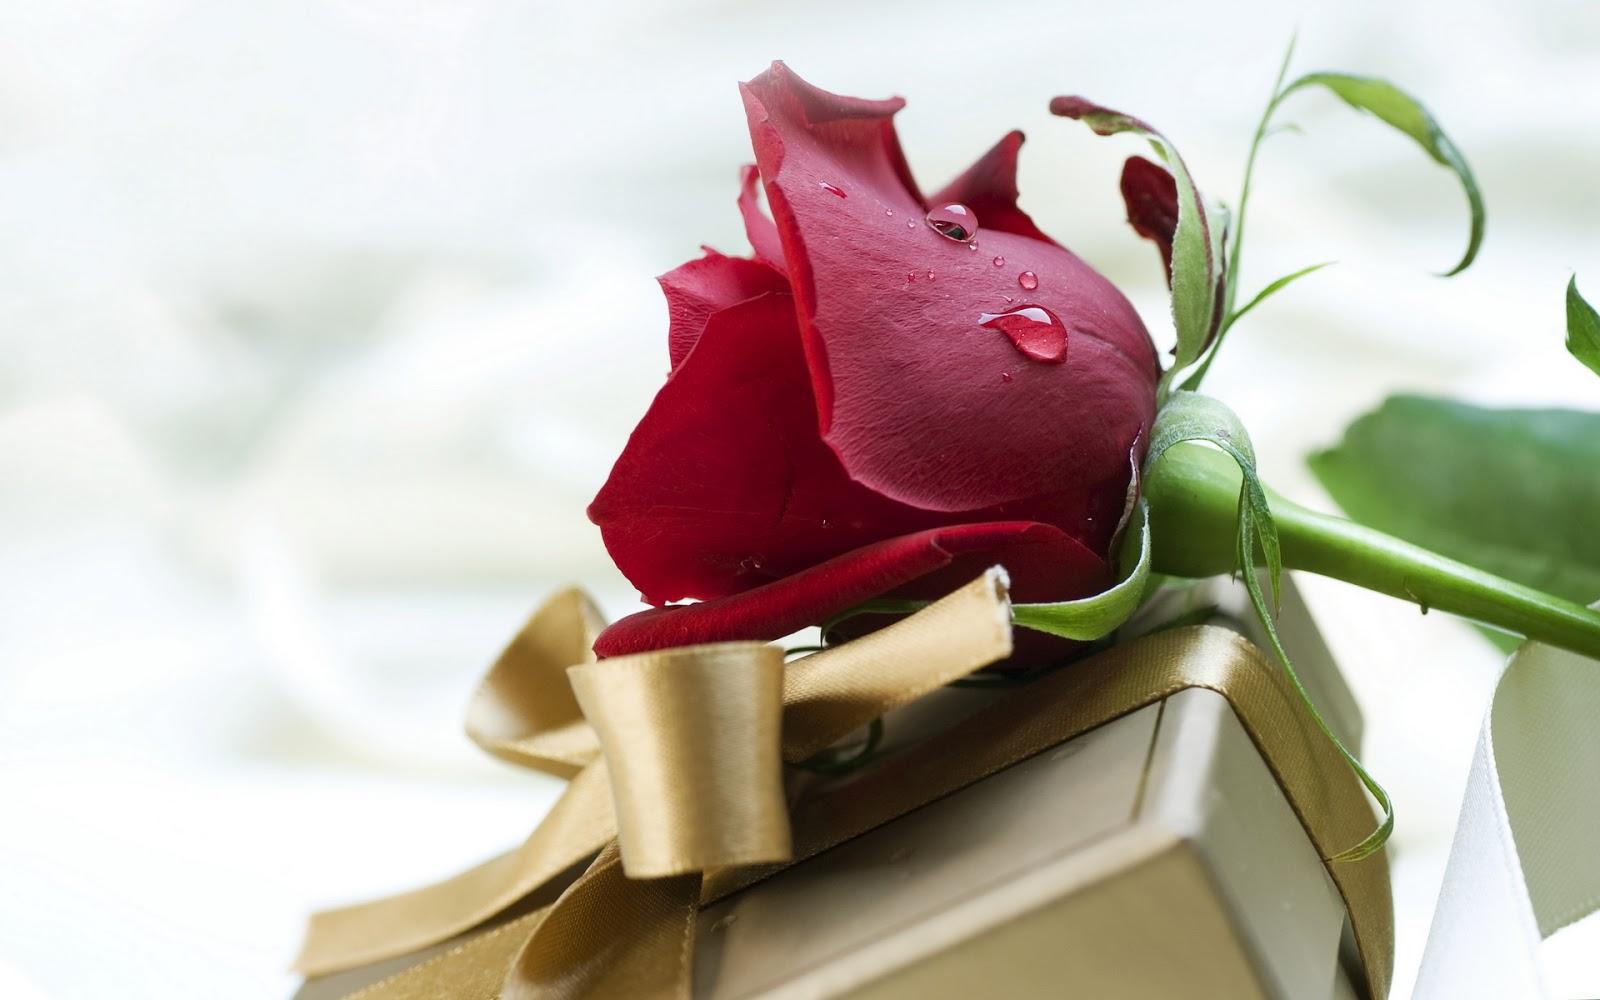 Fondo De Pantalla Dia De San Valentin Regalo Con Rosa: Fondo De Pantalla Dia De San Valentin Rosa Mas Regalo Sorpresa